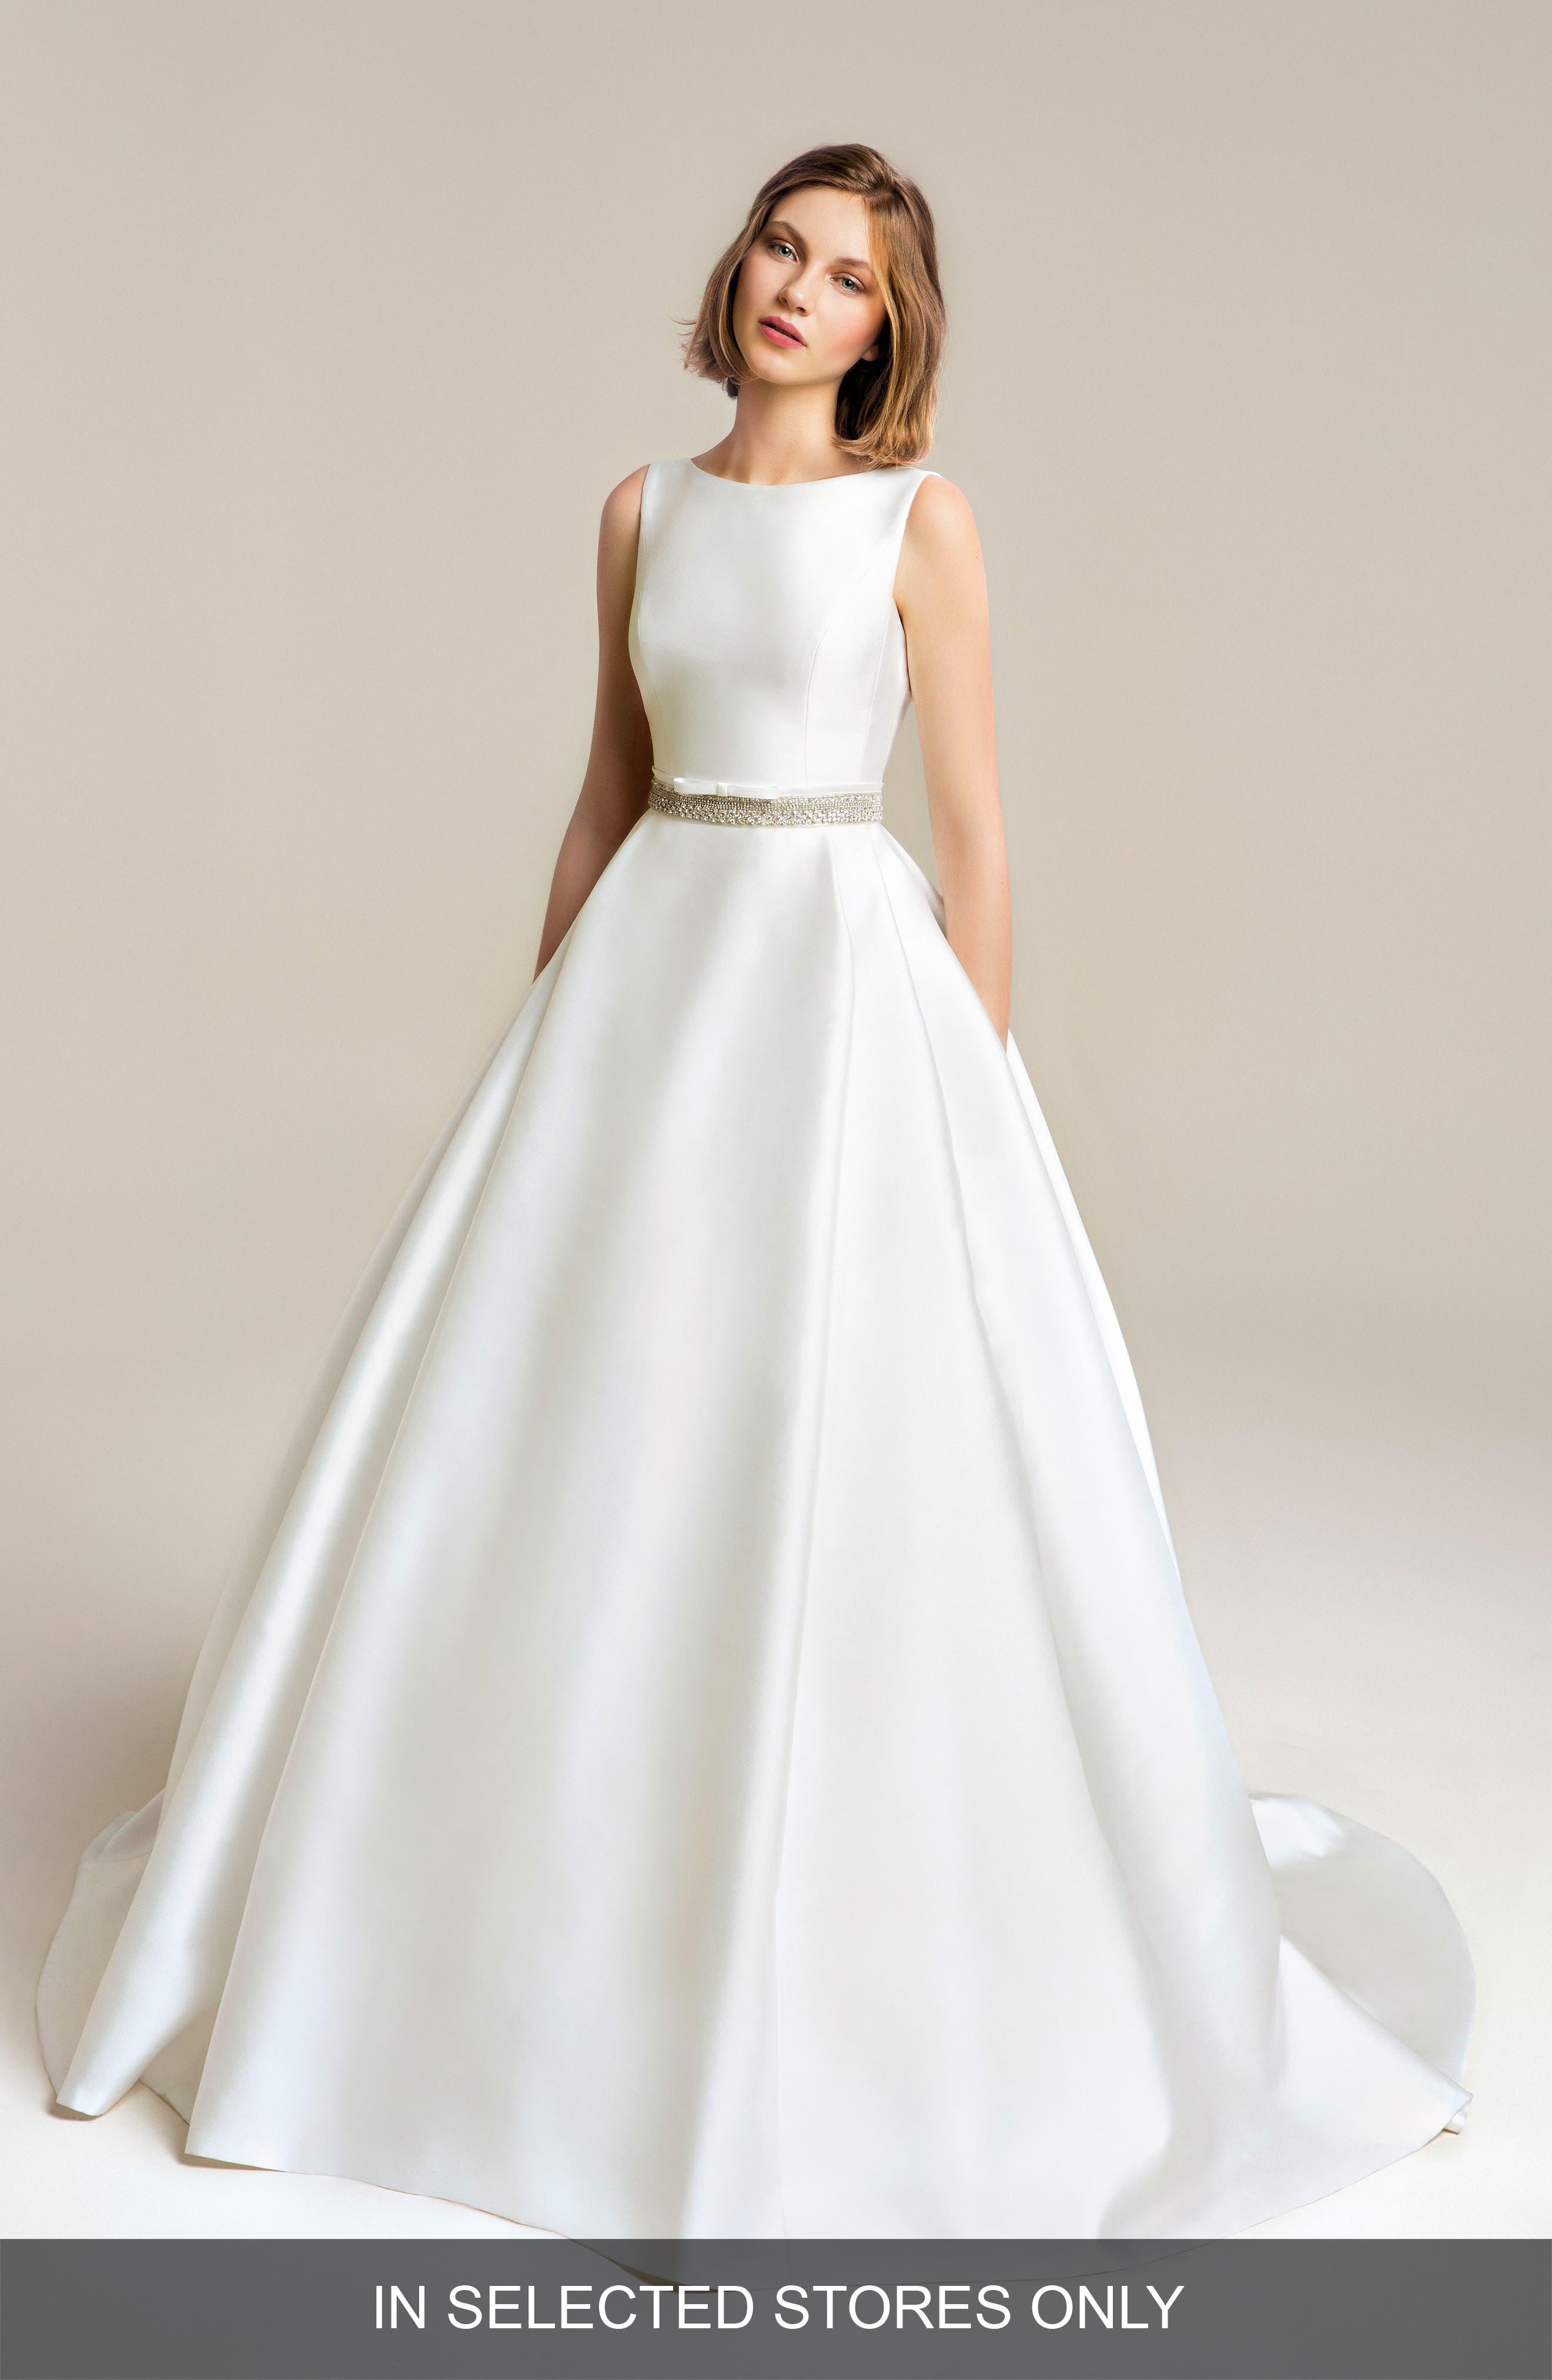 Jesus Peiro Satin Beaded Detail Wedding Dress, Size IN STORE ONLY - White